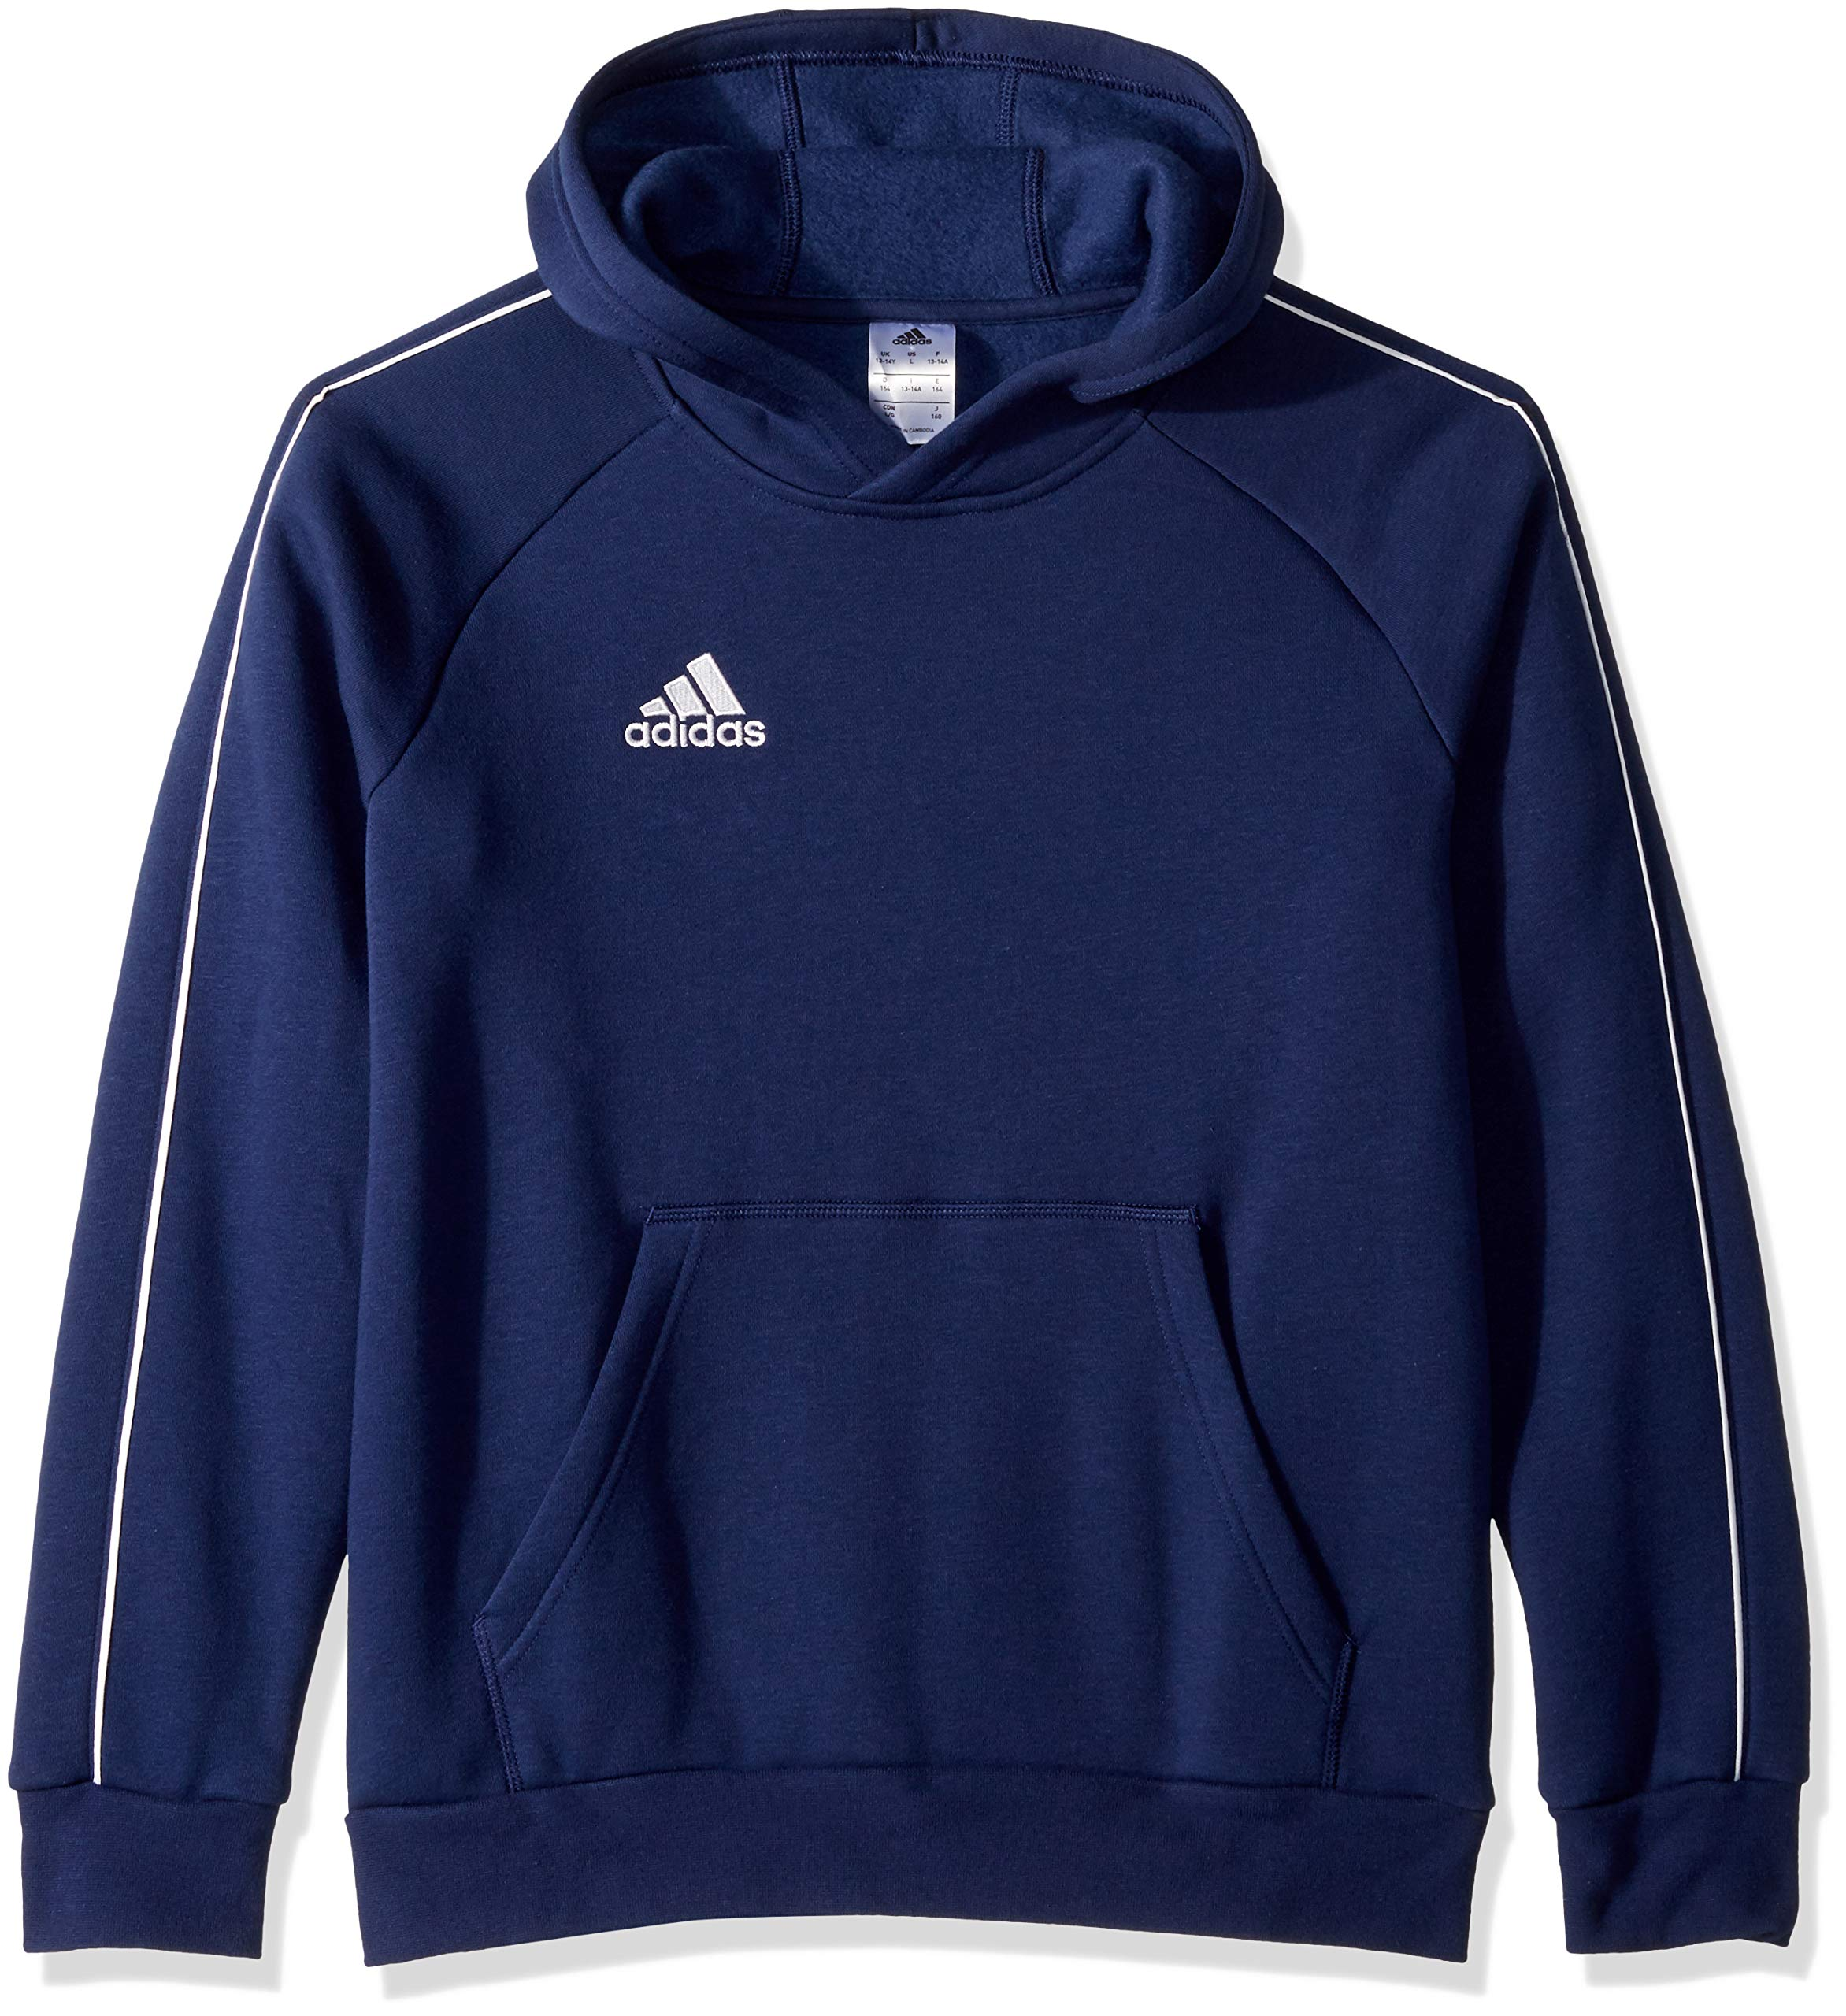 adidas Unisex Youth Soccer Core18 Hoody, Dark Blue/White, Medium